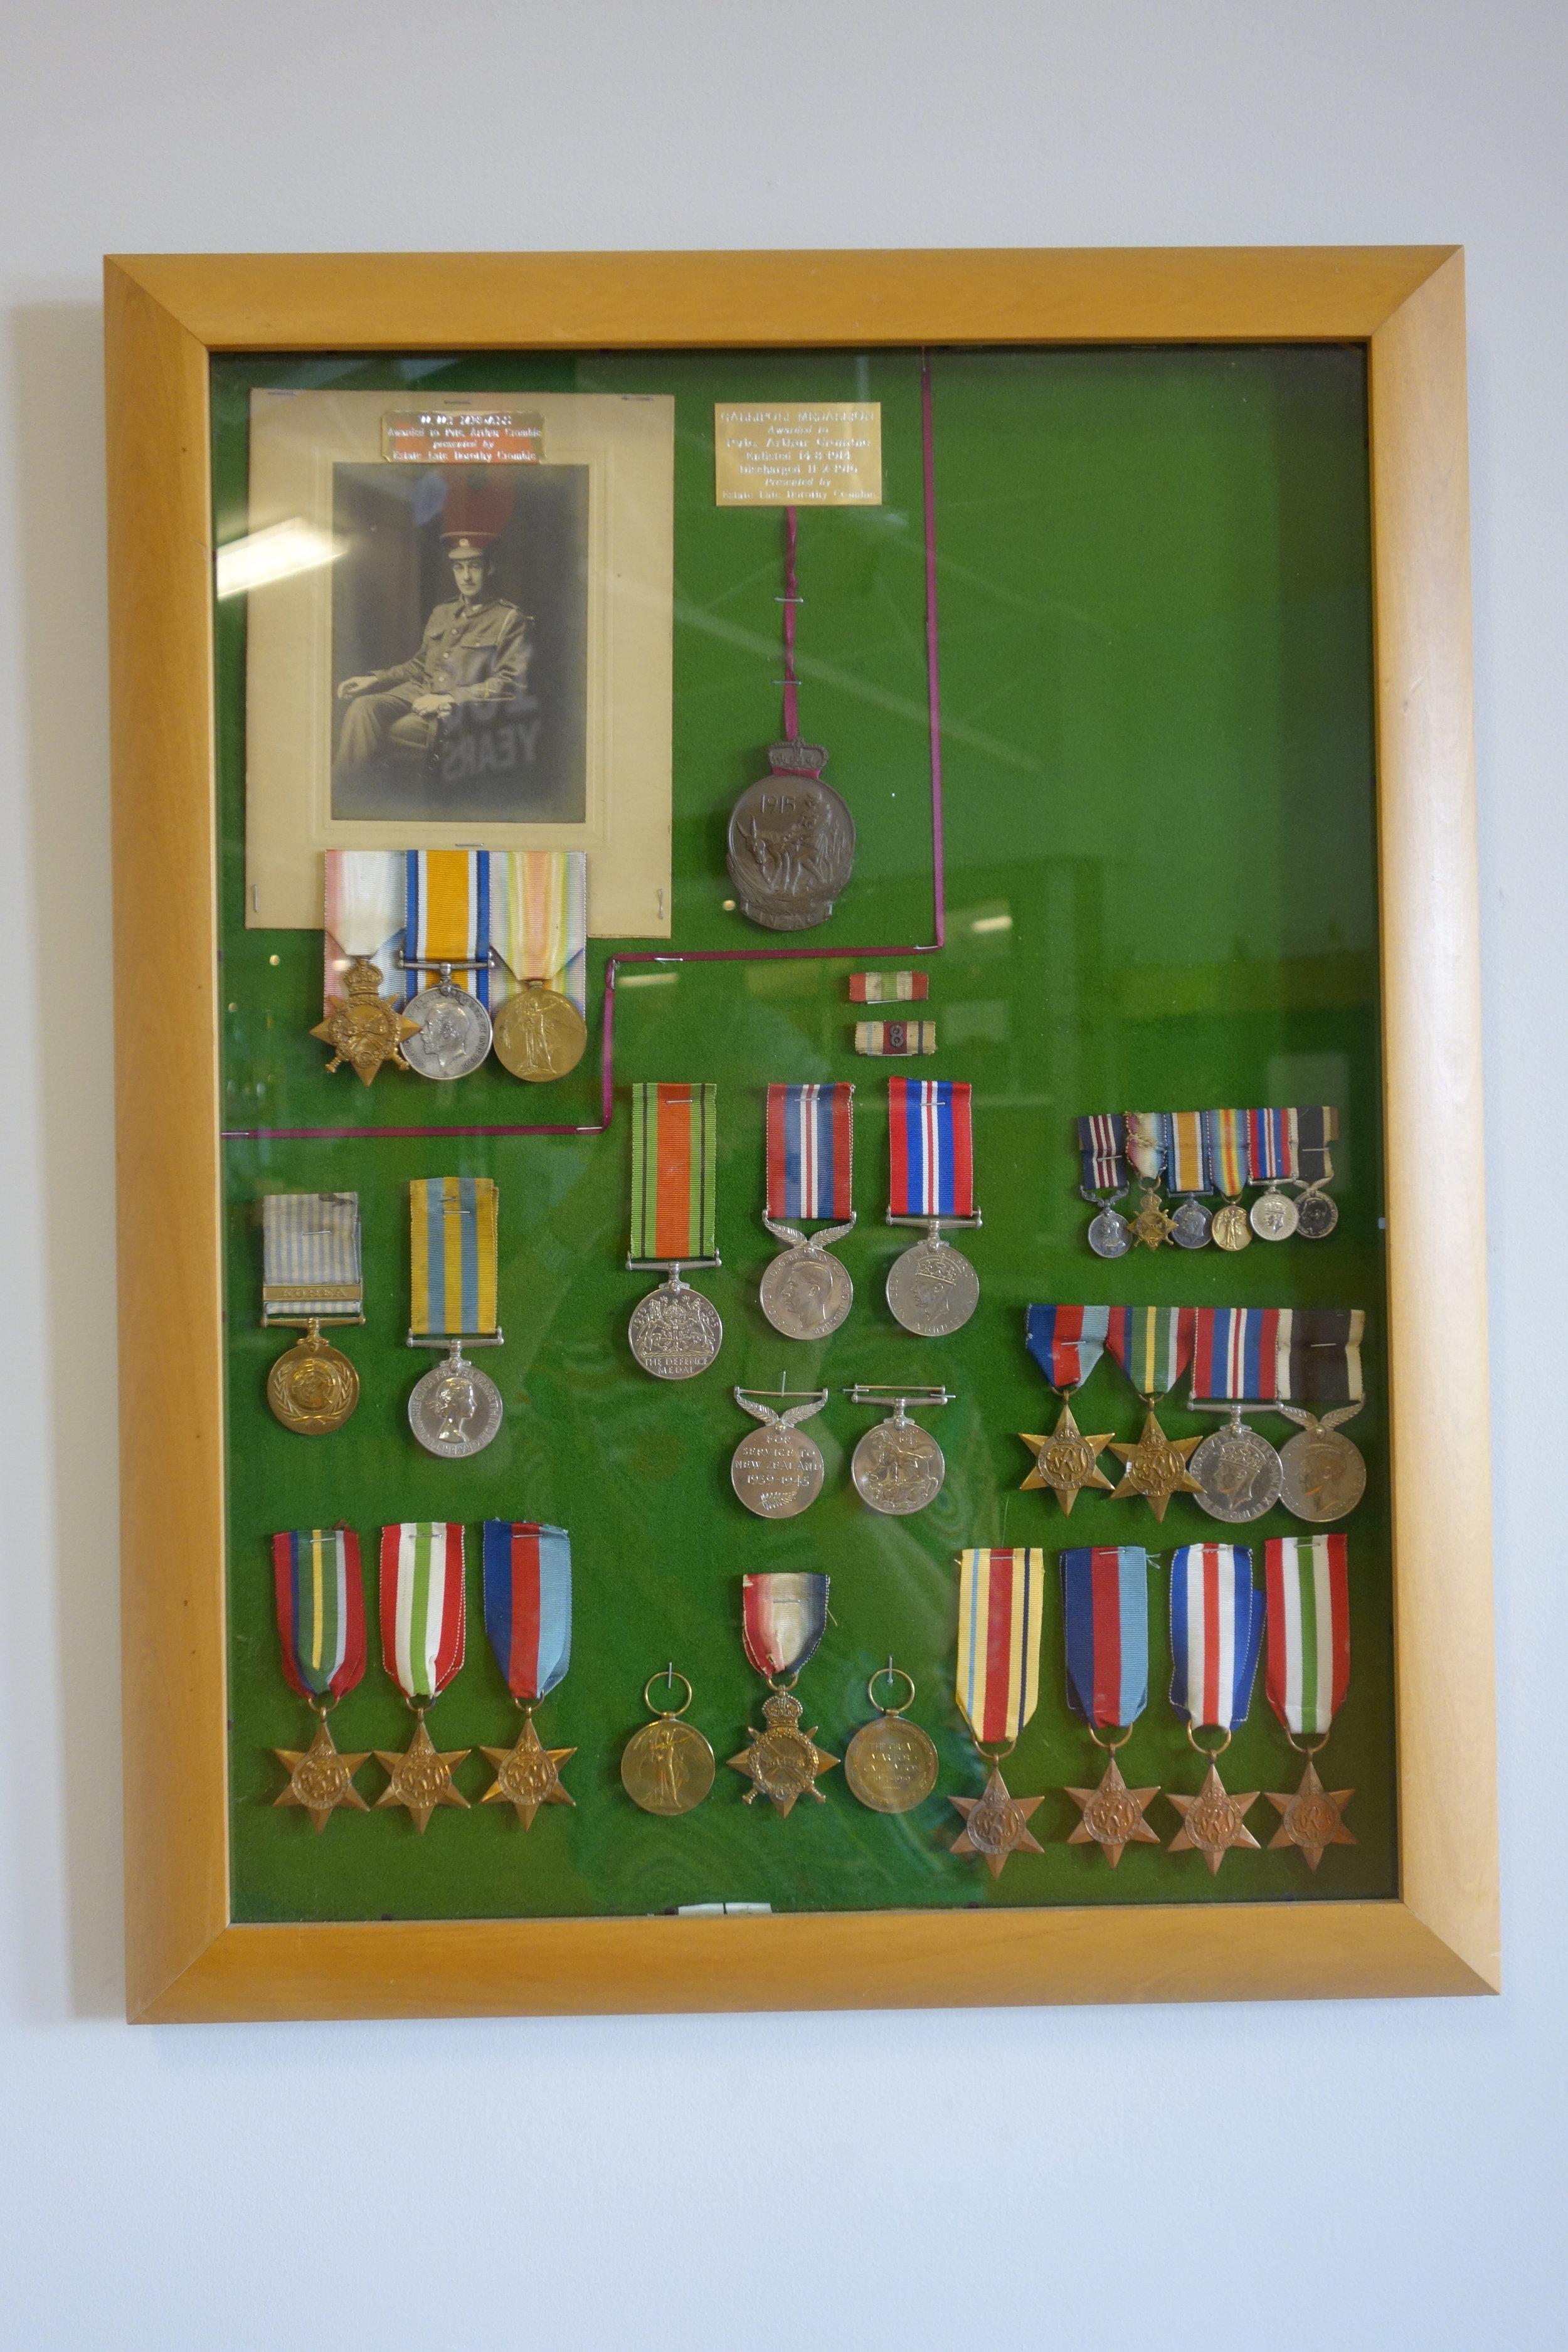 RSA medals